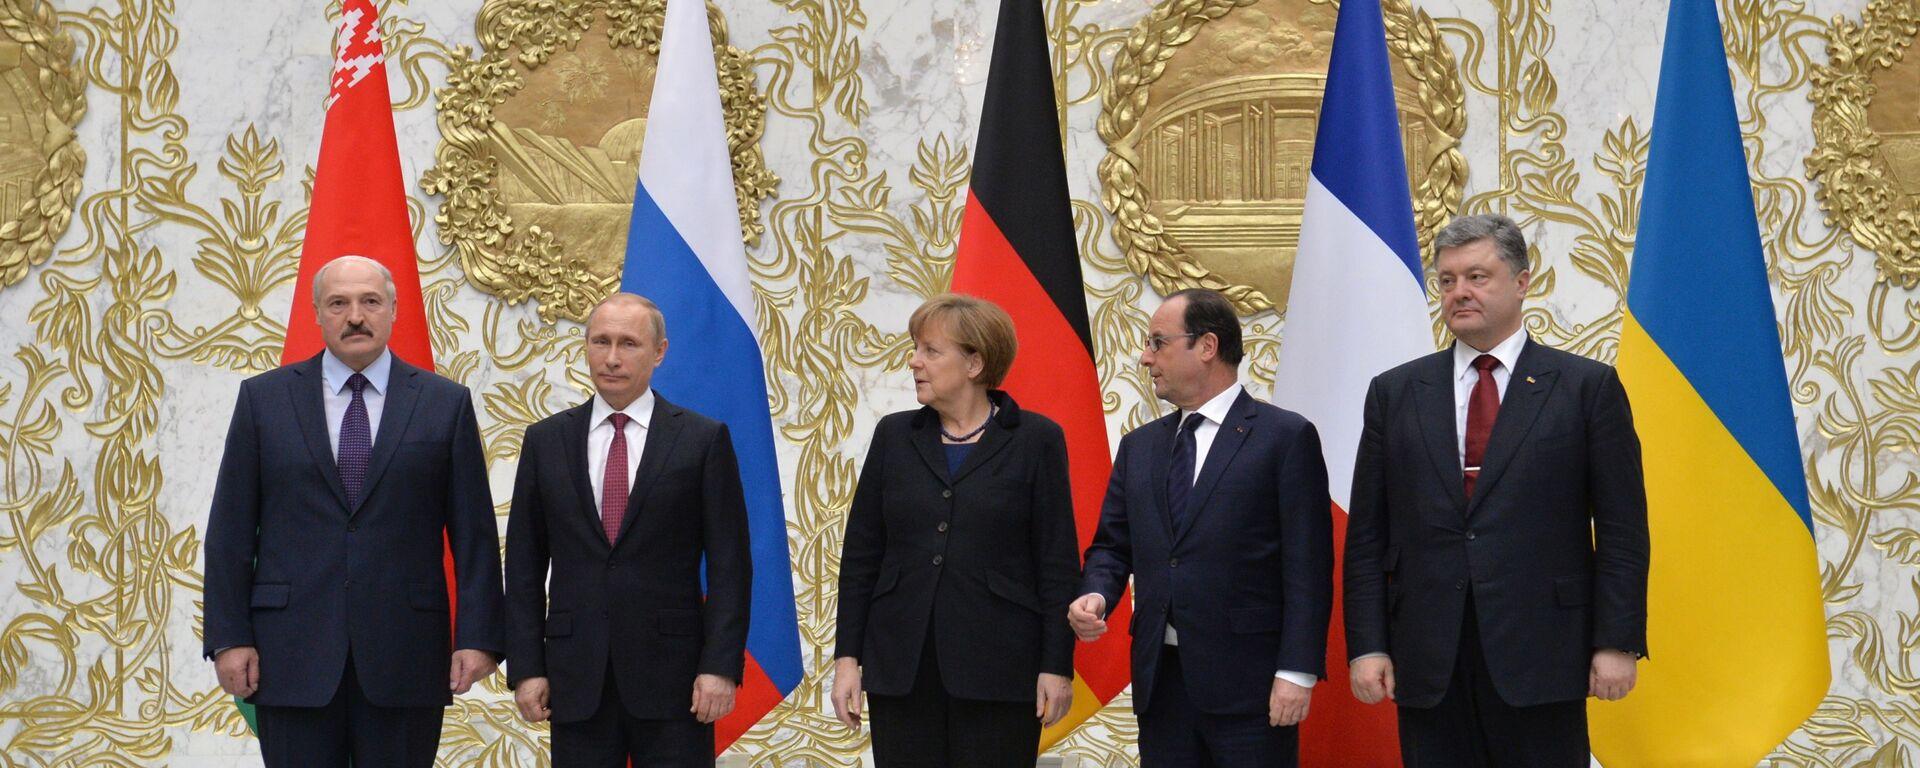 Peregovorы liderov Rossii, Germanii, Frantsii i Ukrainы v Minske - Sputnik Oʻzbekiston, 1920, 19.02.2020